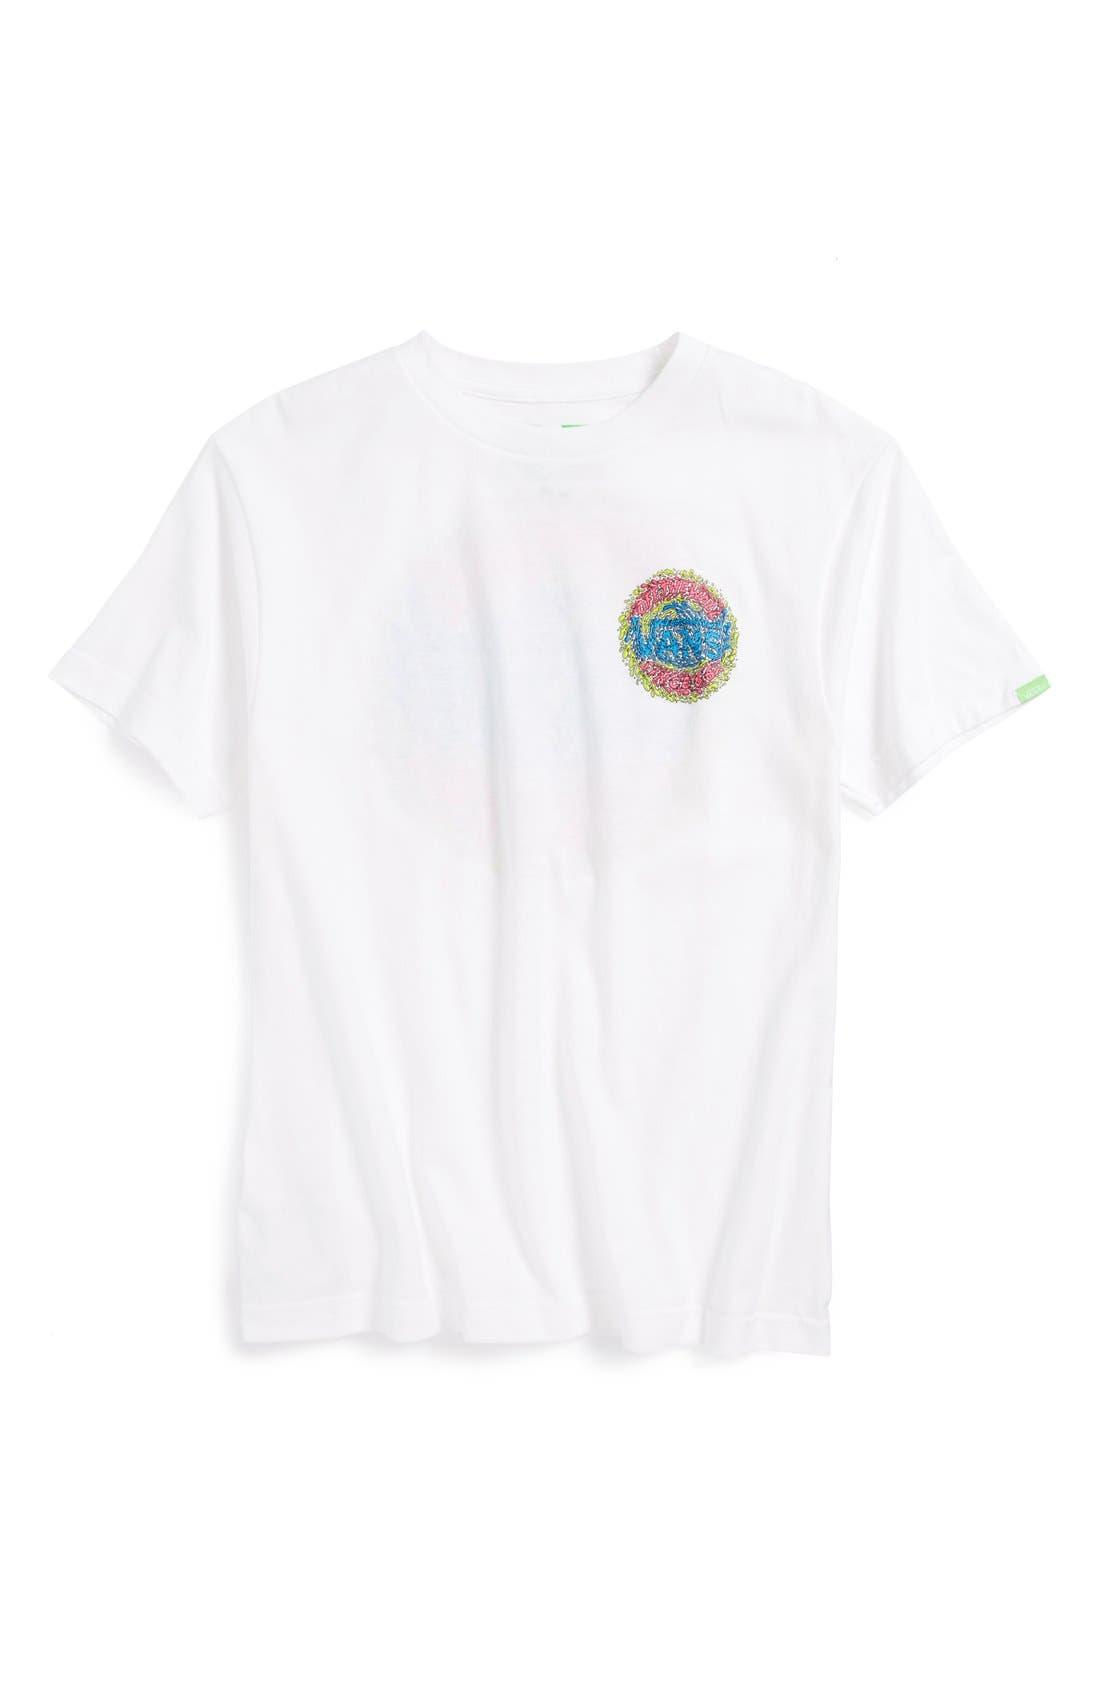 Alternate Image 1 Selected - Vans 'Slimed' Graphic T-Shirt (Big Boys)